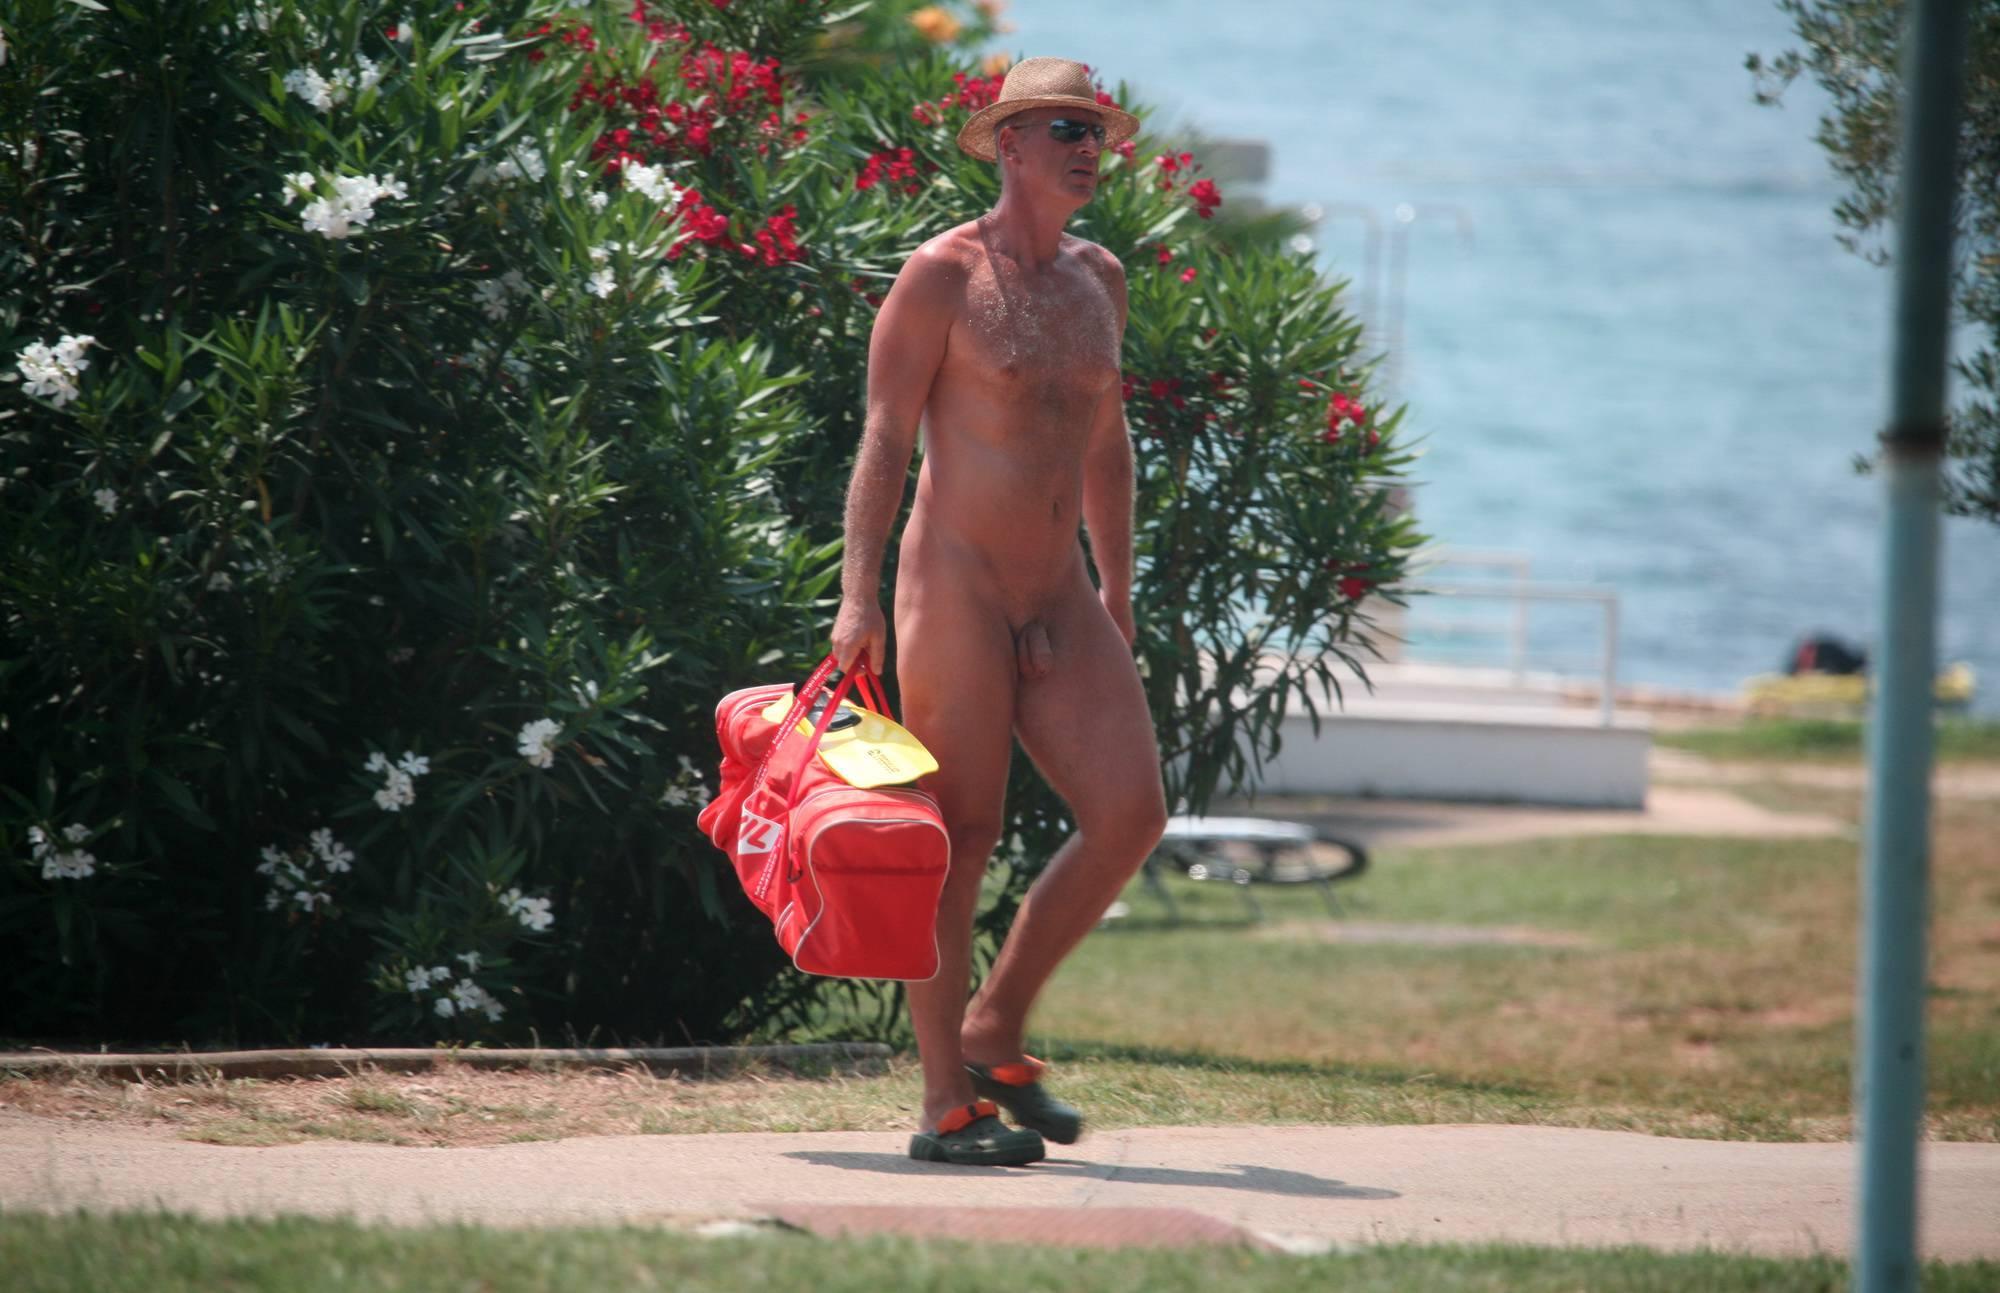 Nudist Photos Naturist Pool Walkaround - 2